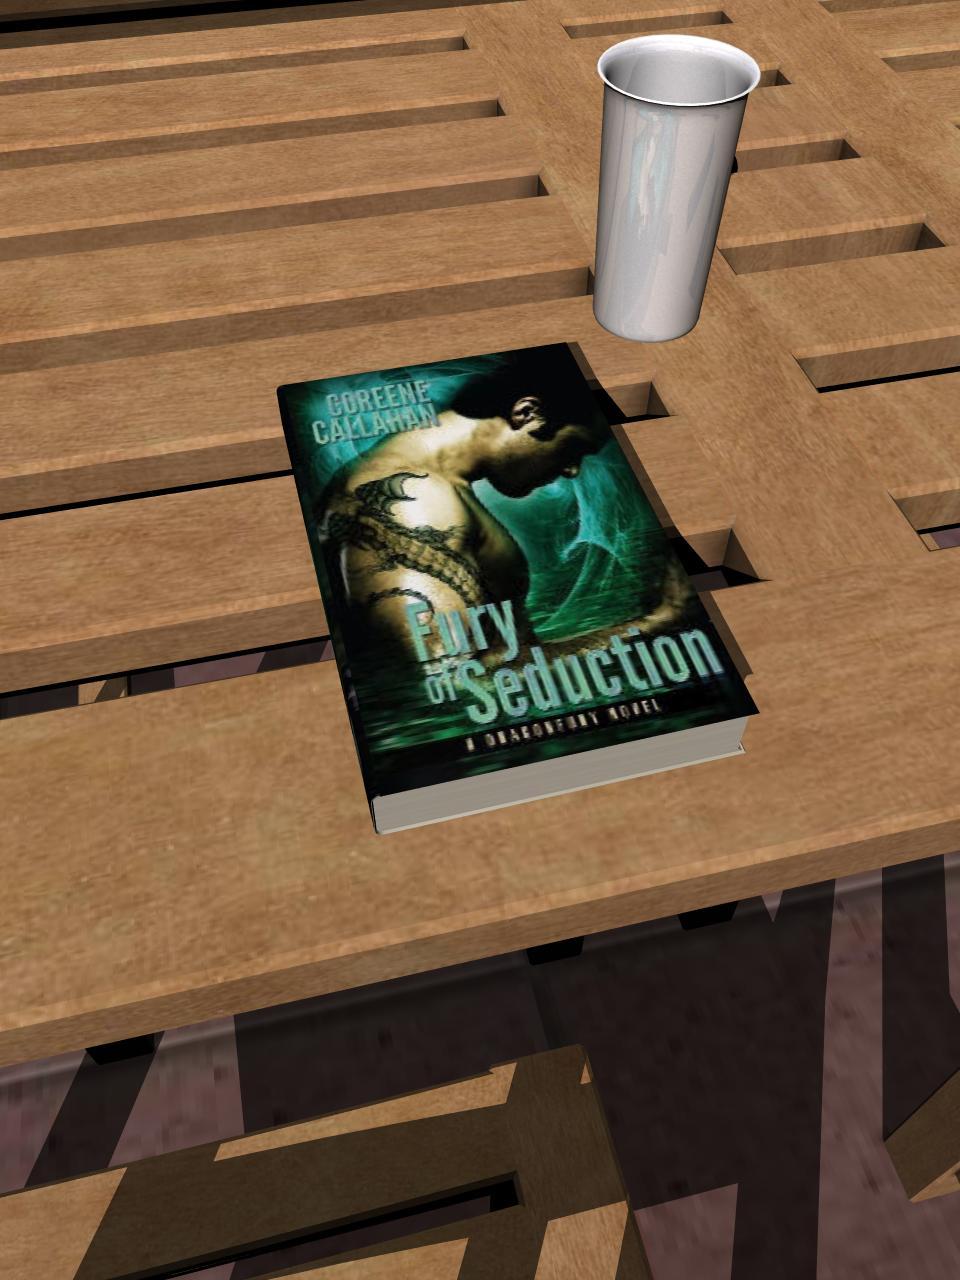 Fury of Seduction (Dragonfury Book3)